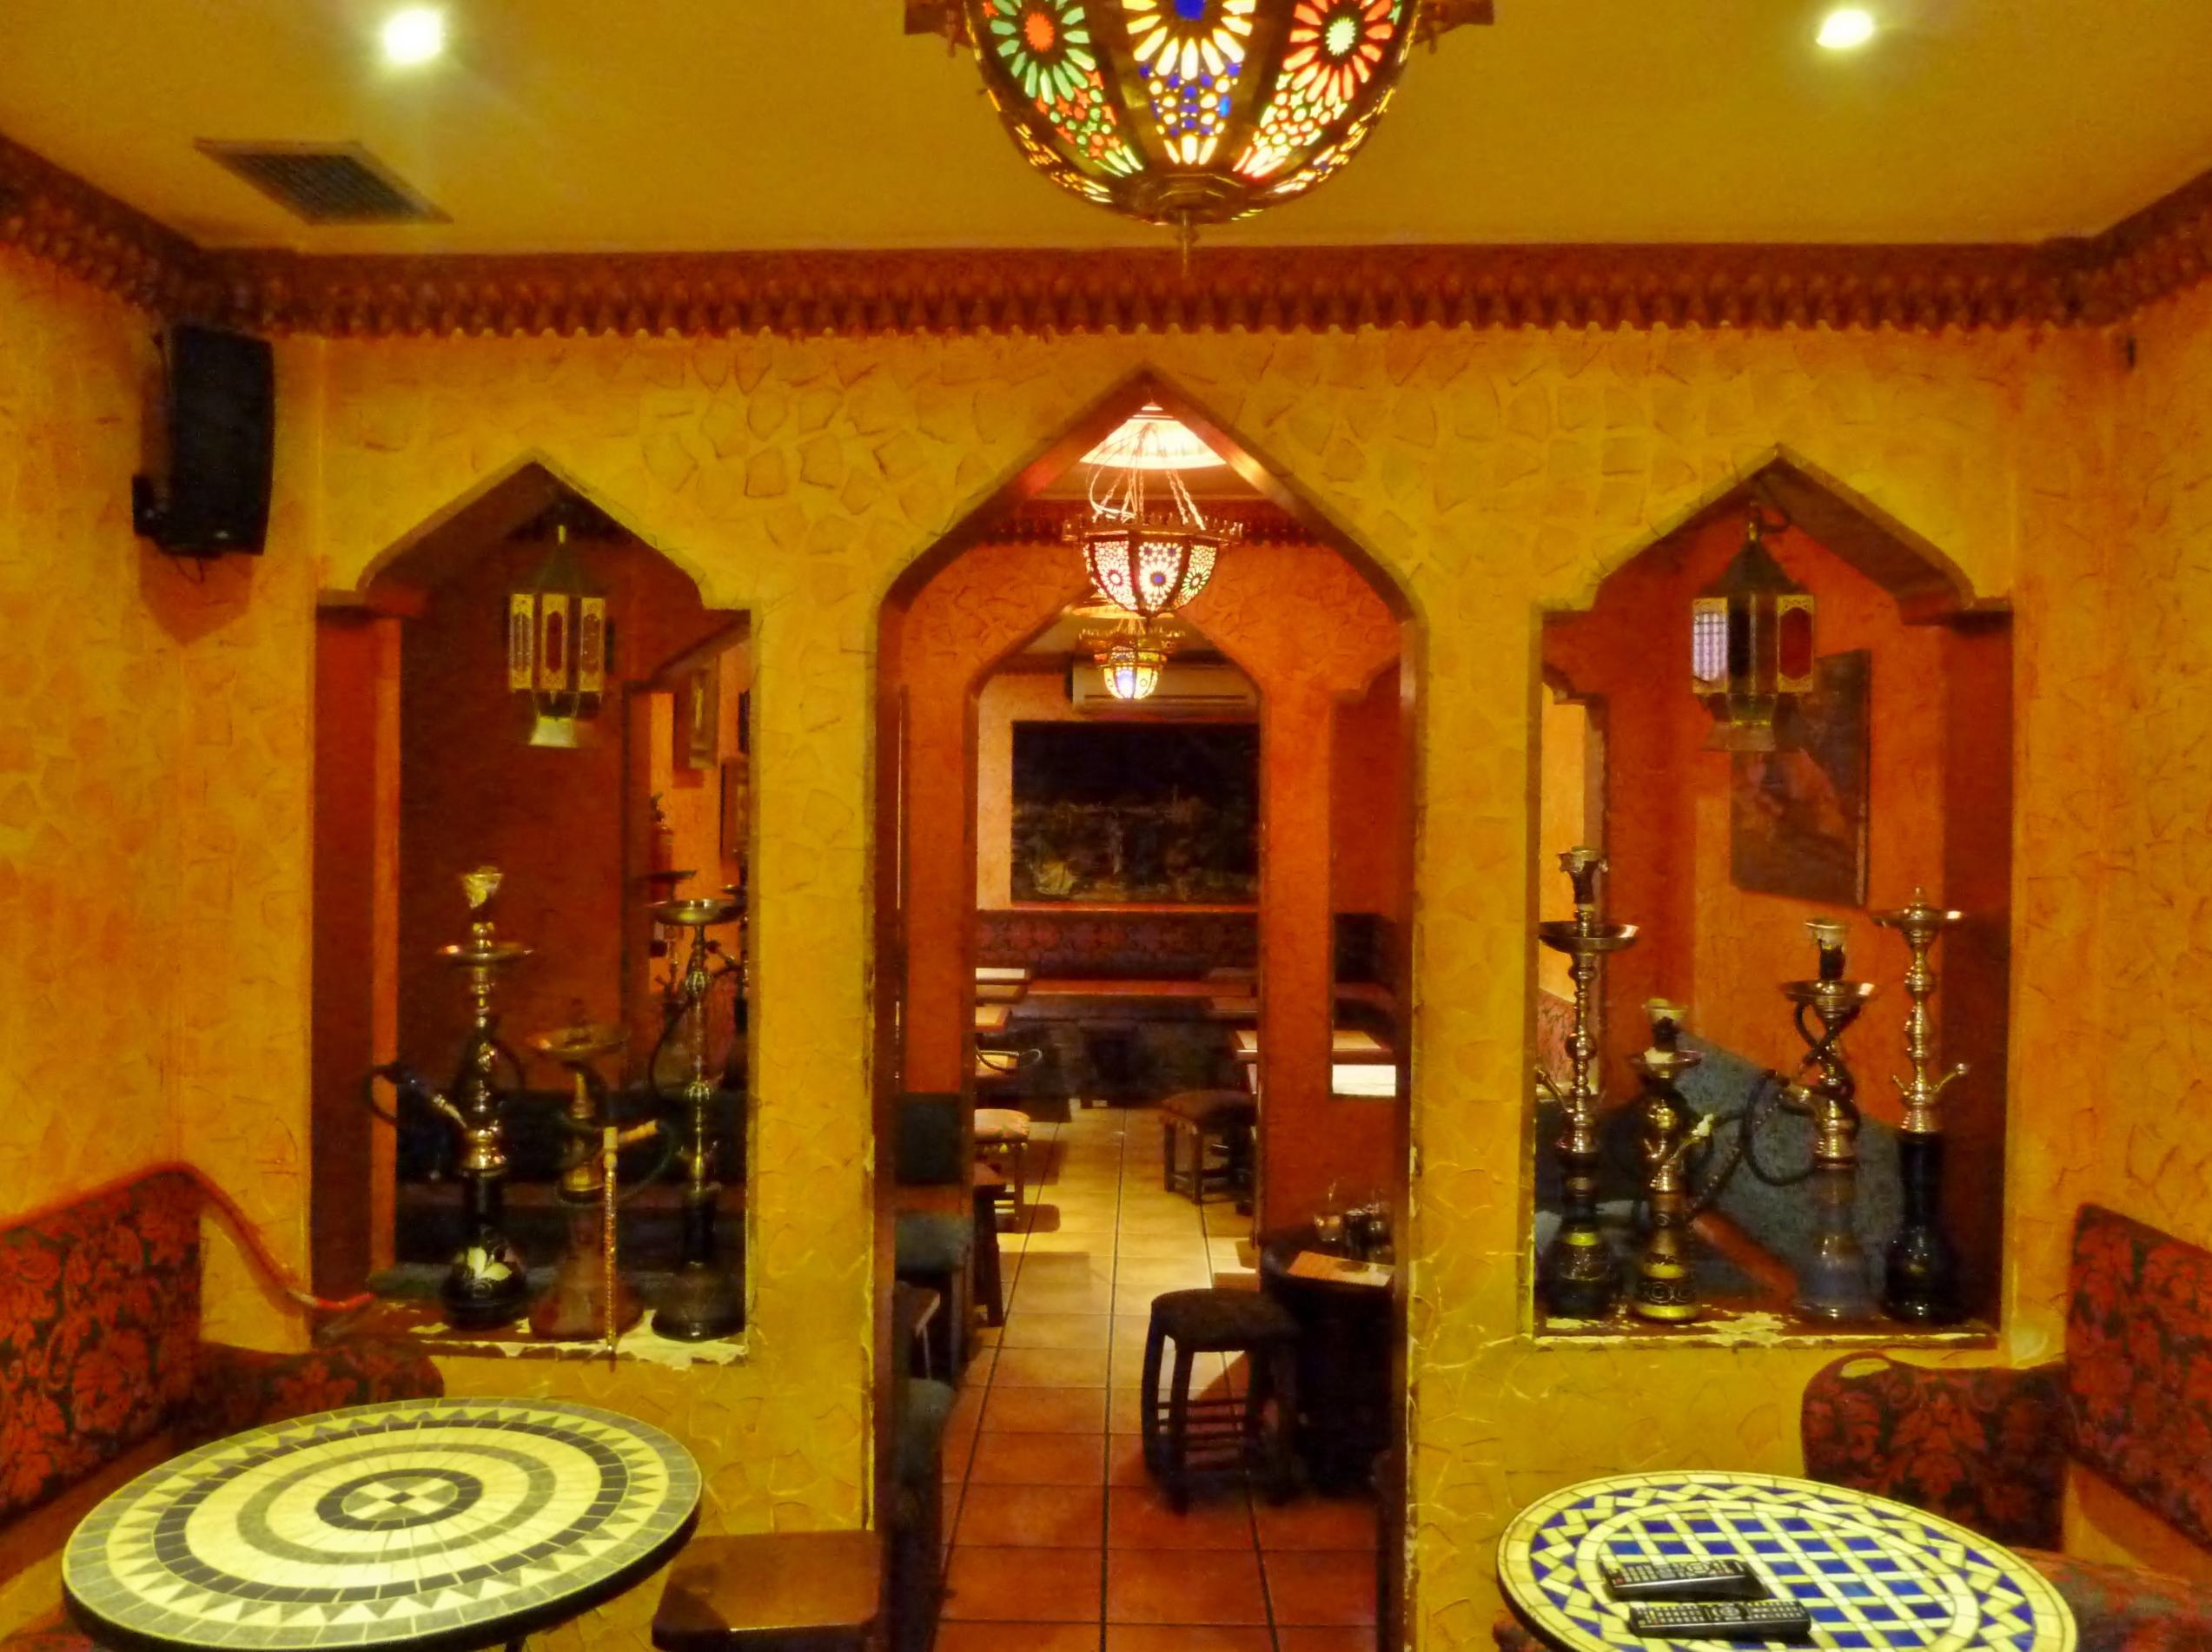 Restaurante habibi el liban s de lavapi s madridmayrit for Muebles estilo arabe